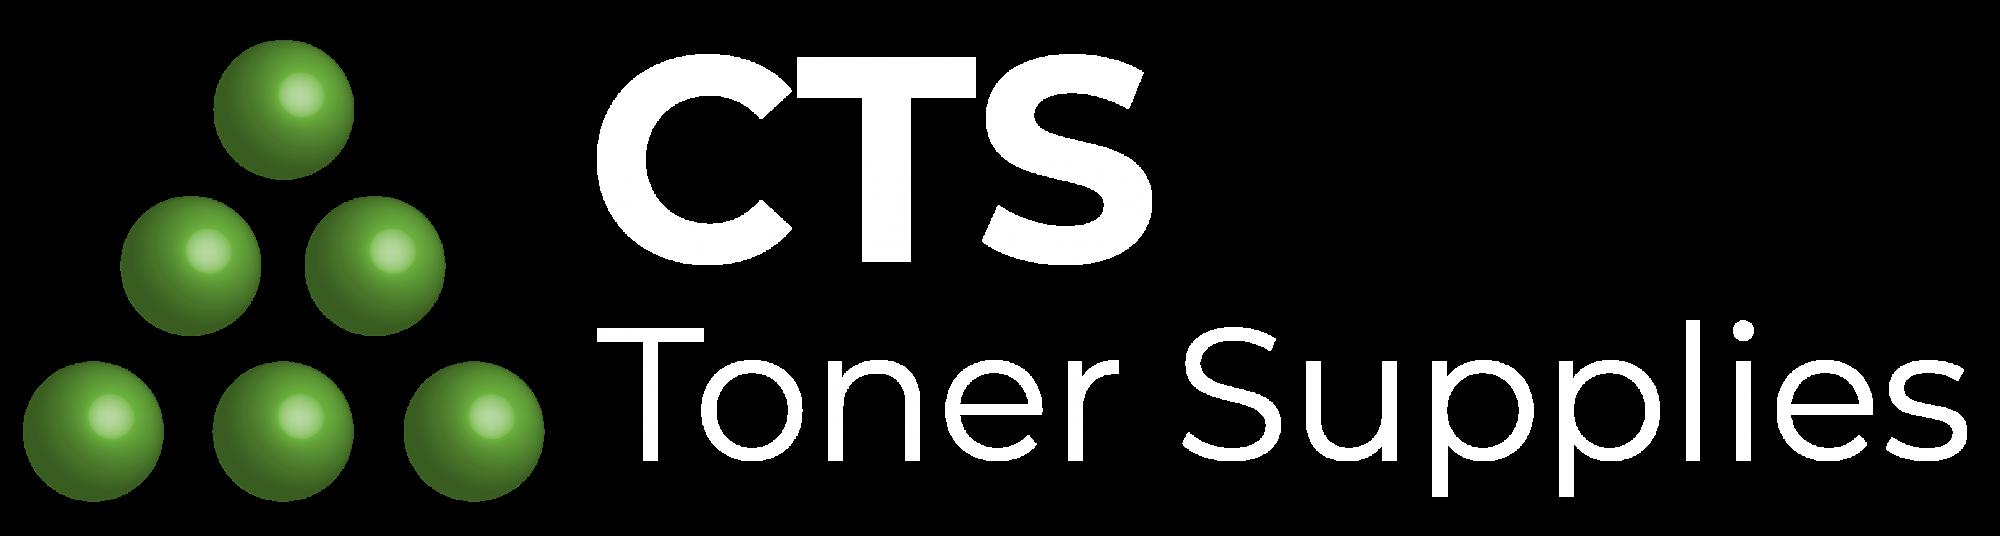 CTS Toner Supplies